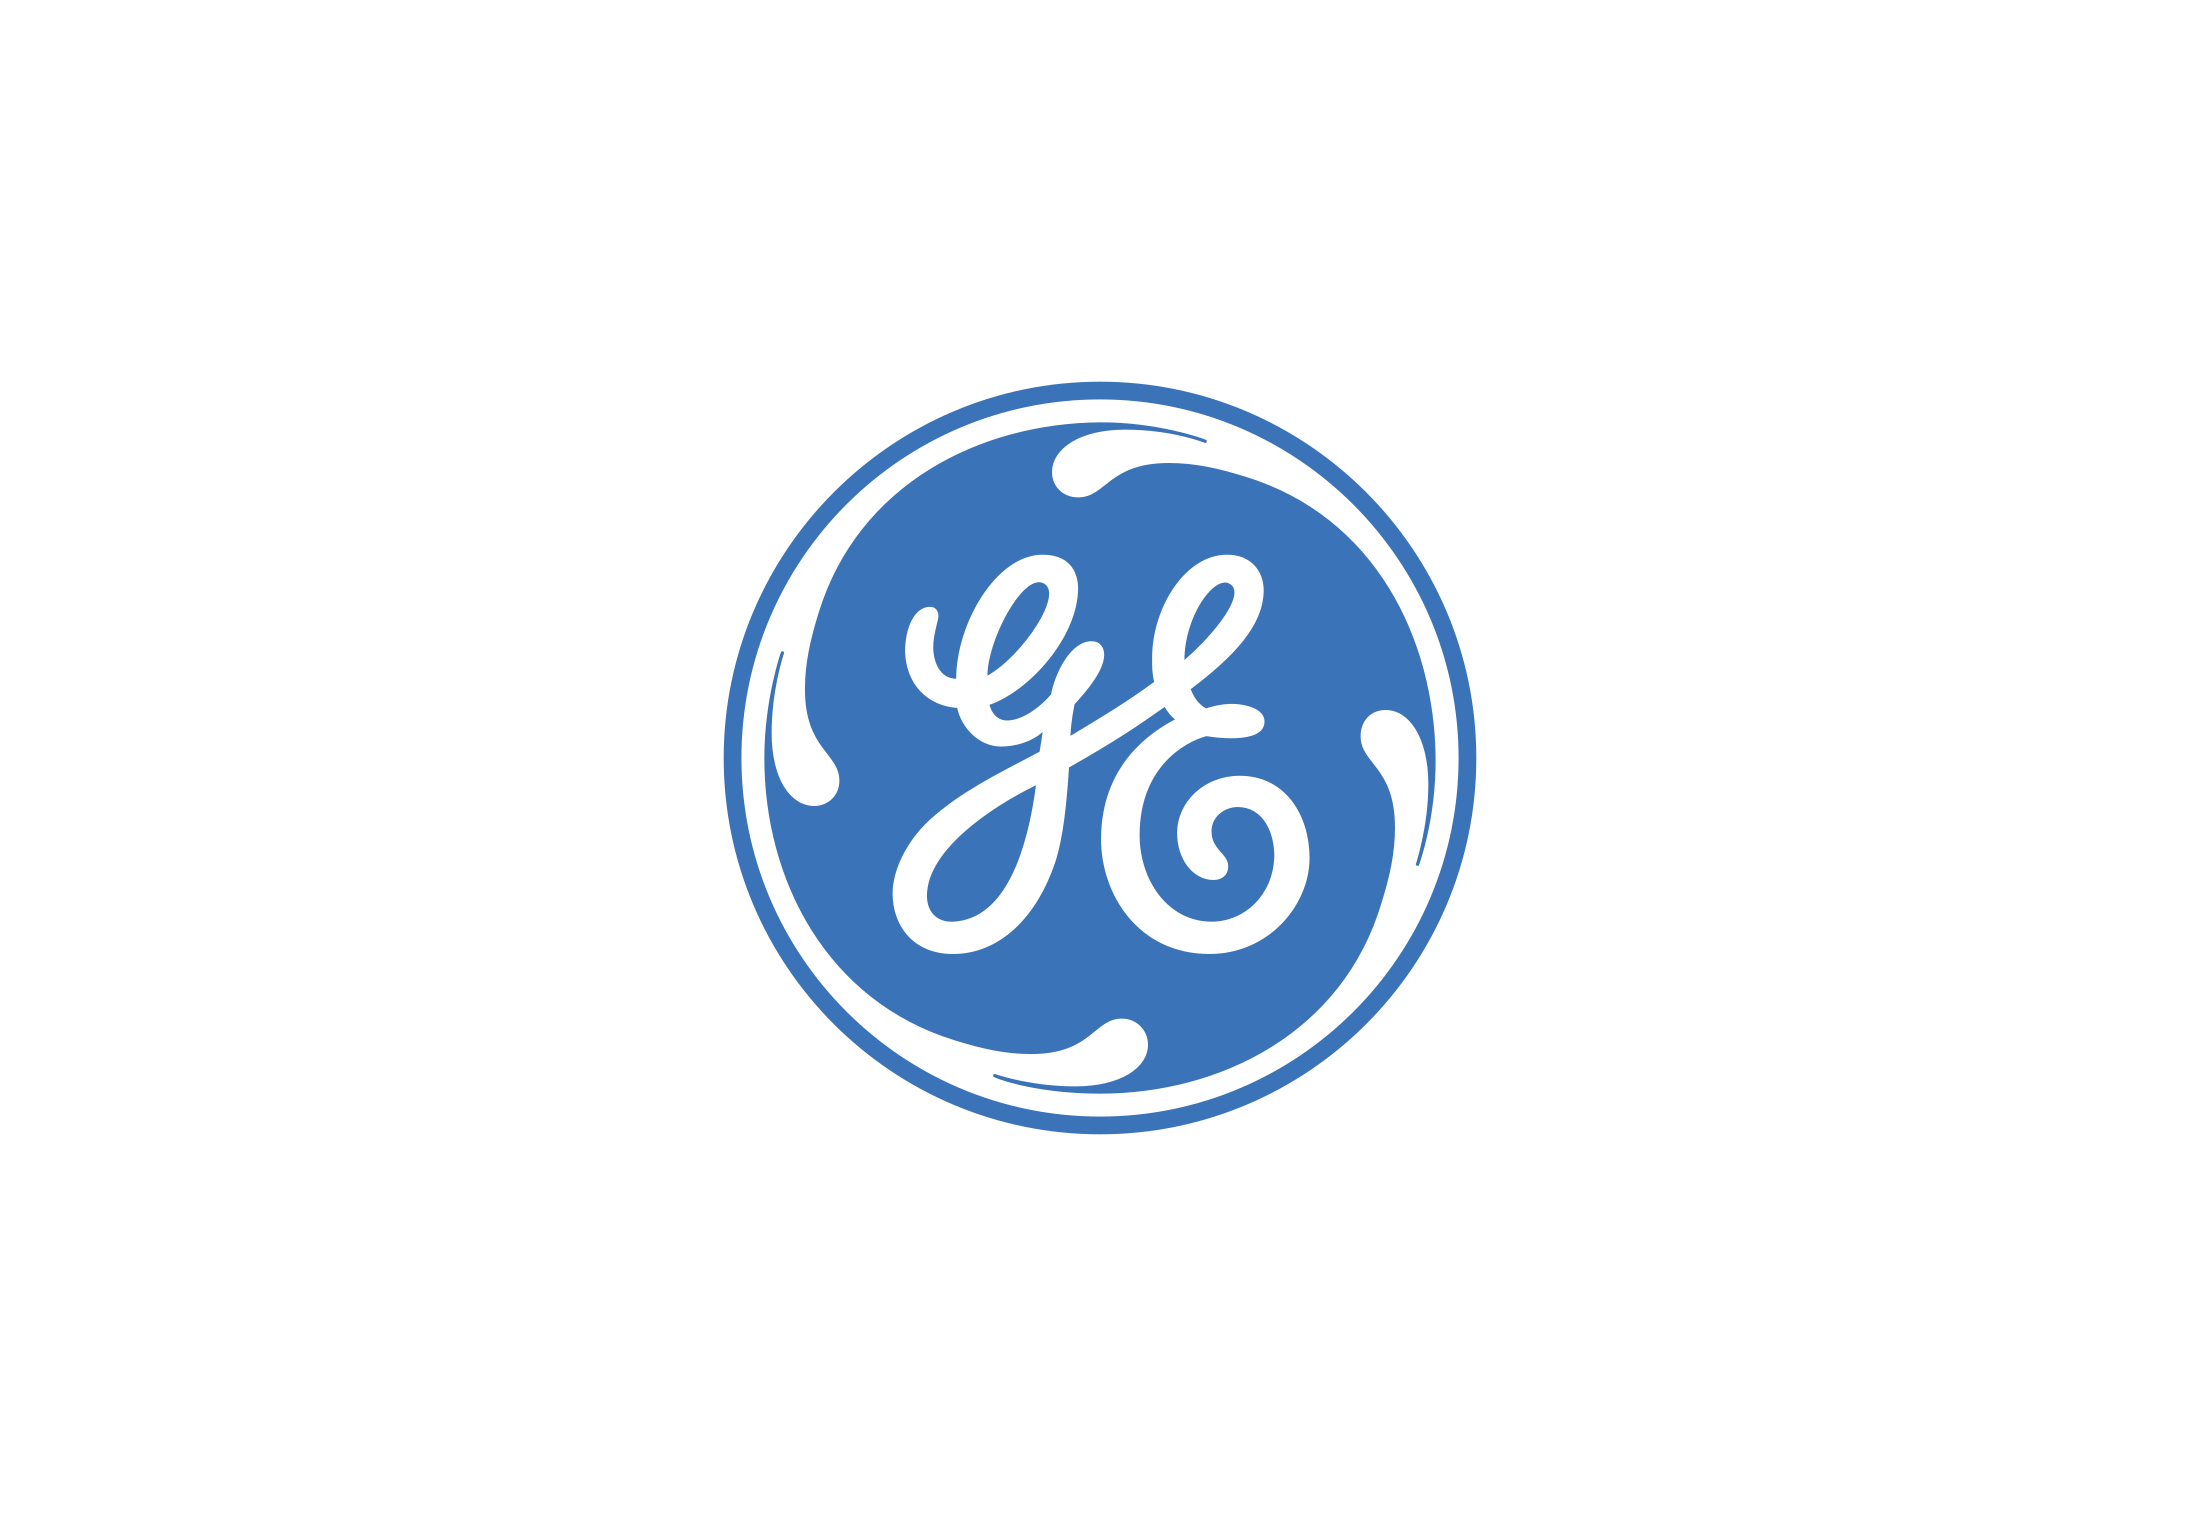 general-electric-logo-01.png